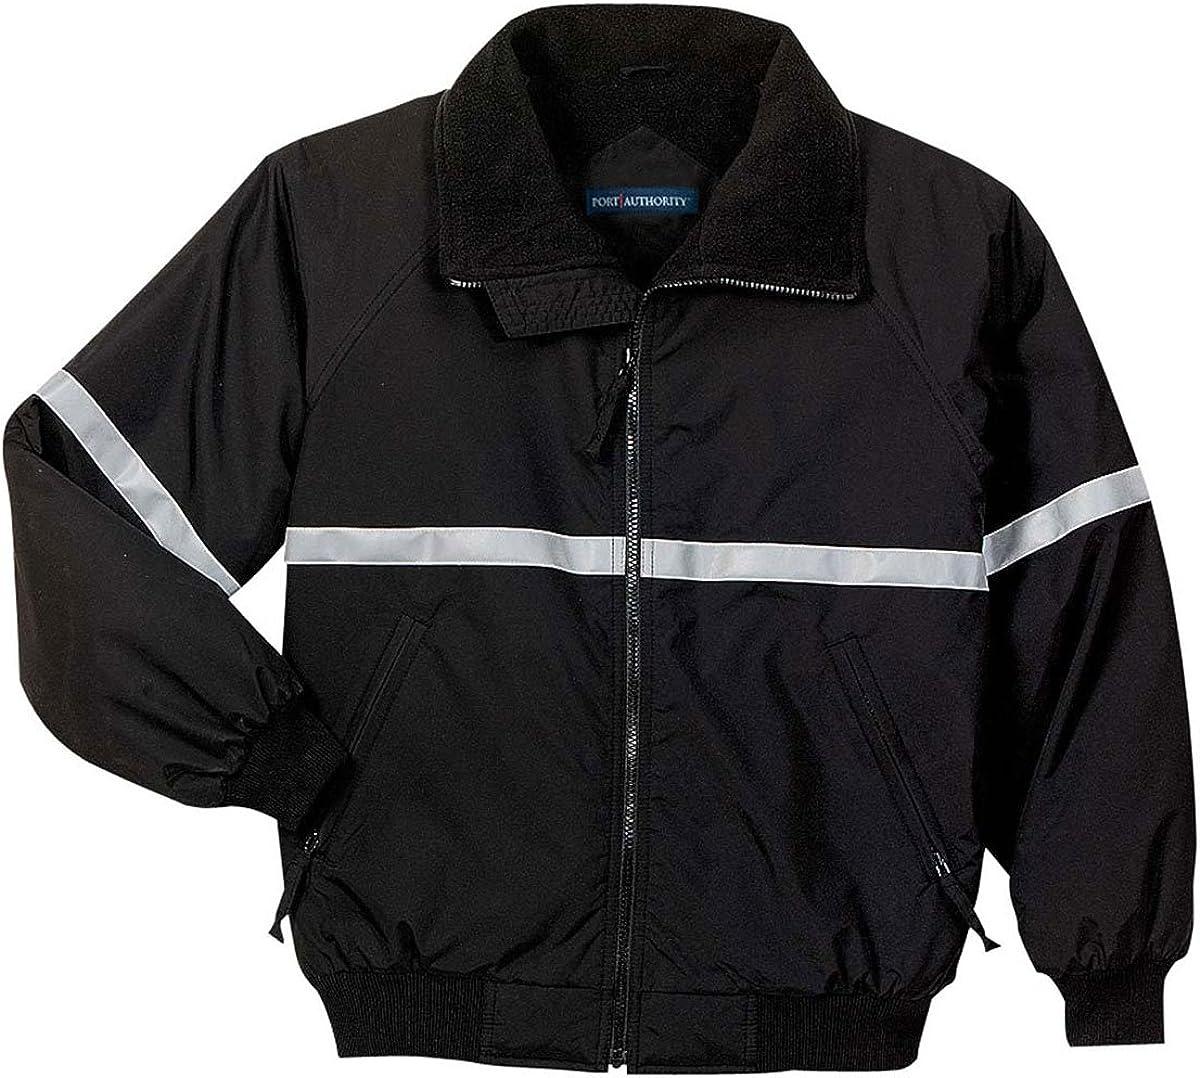 Port Authority Men's Warm Zippered Jacket